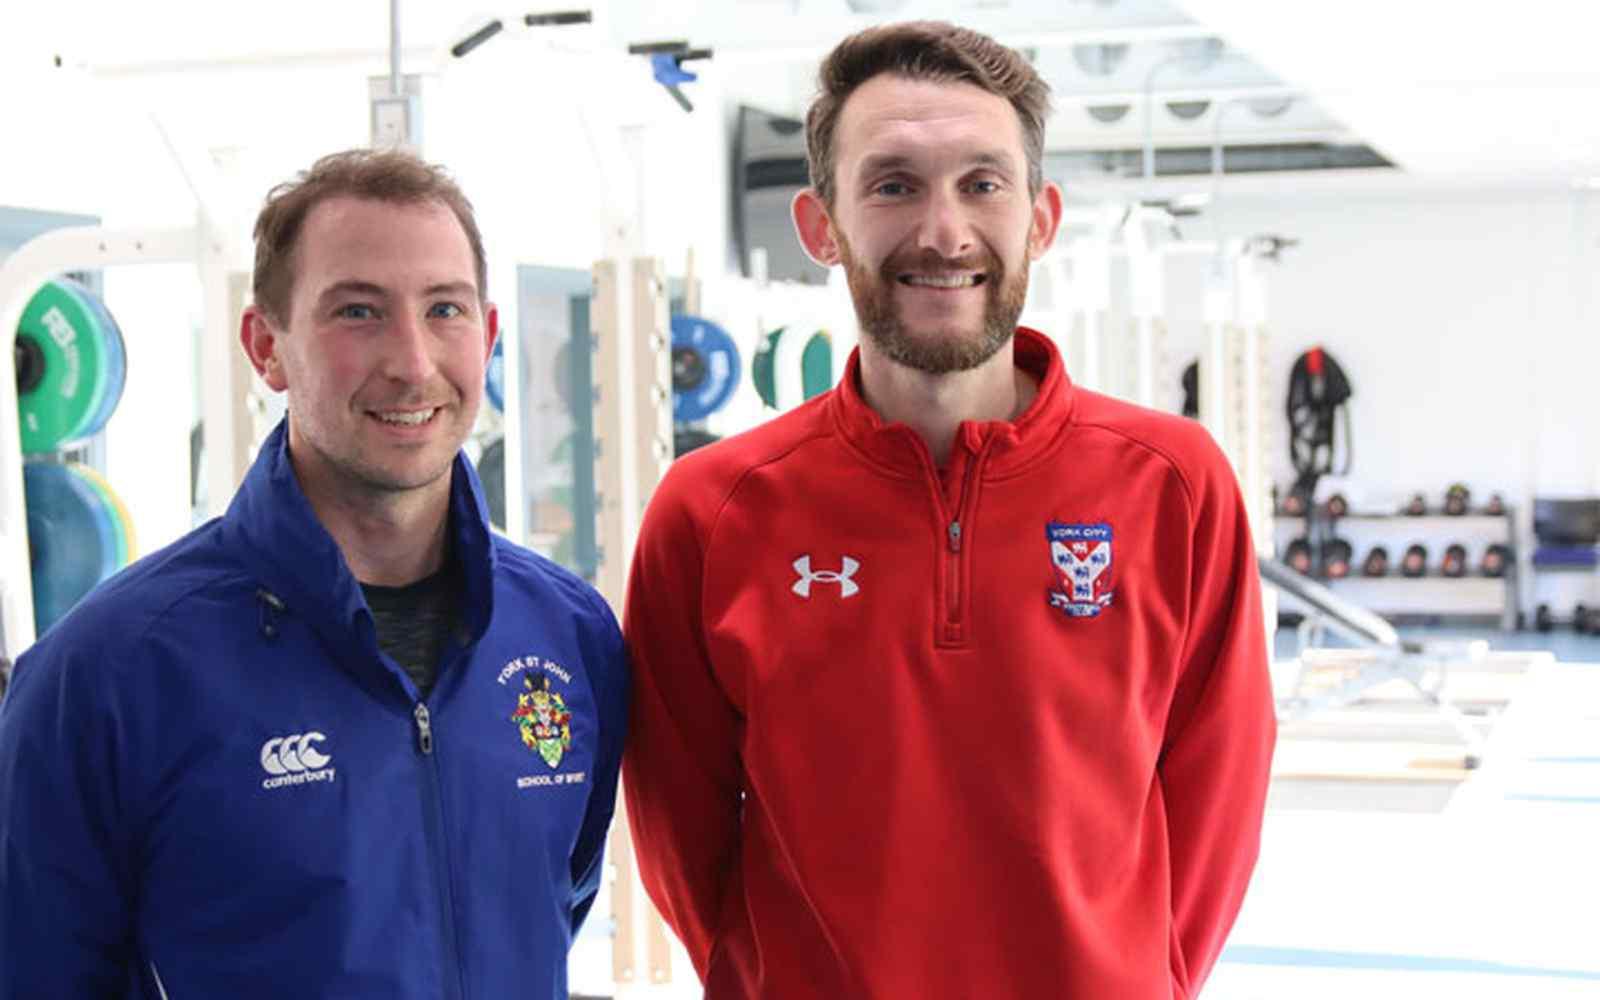 Jamie Salter from York St John next to Chris Pegg from York City FC